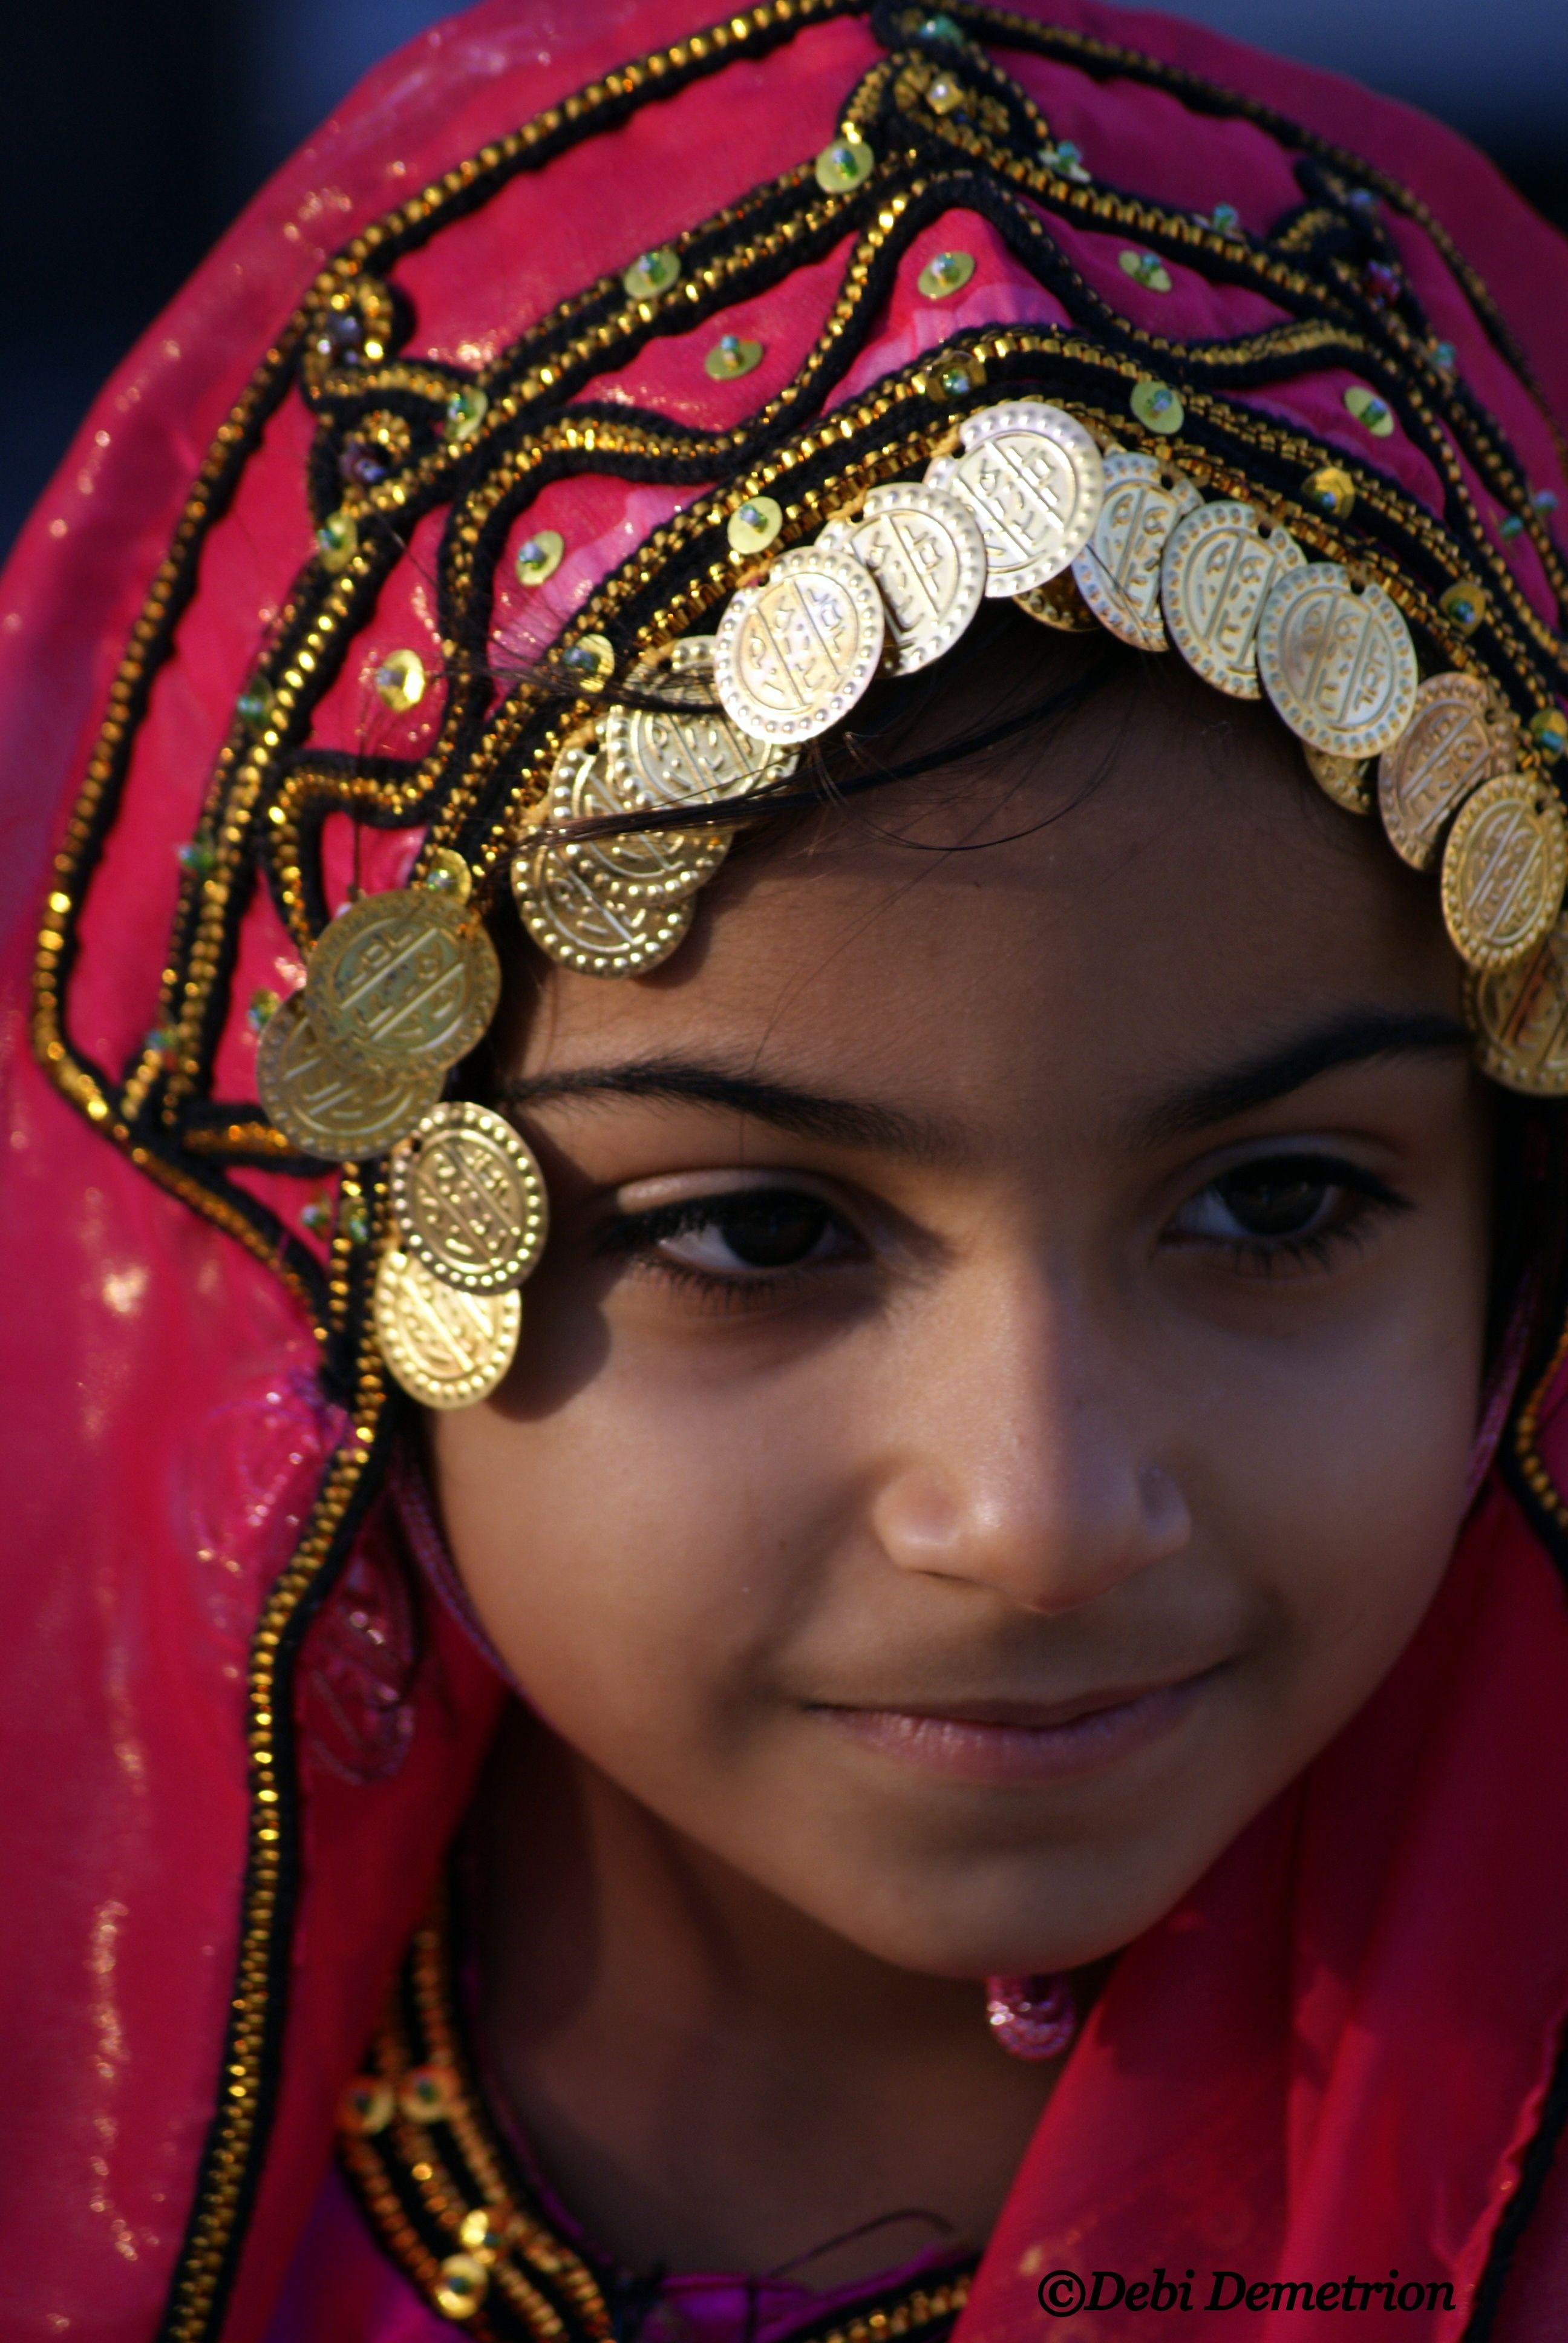 Young Omani Girl Beautiful Children People Of The World Beautiful People